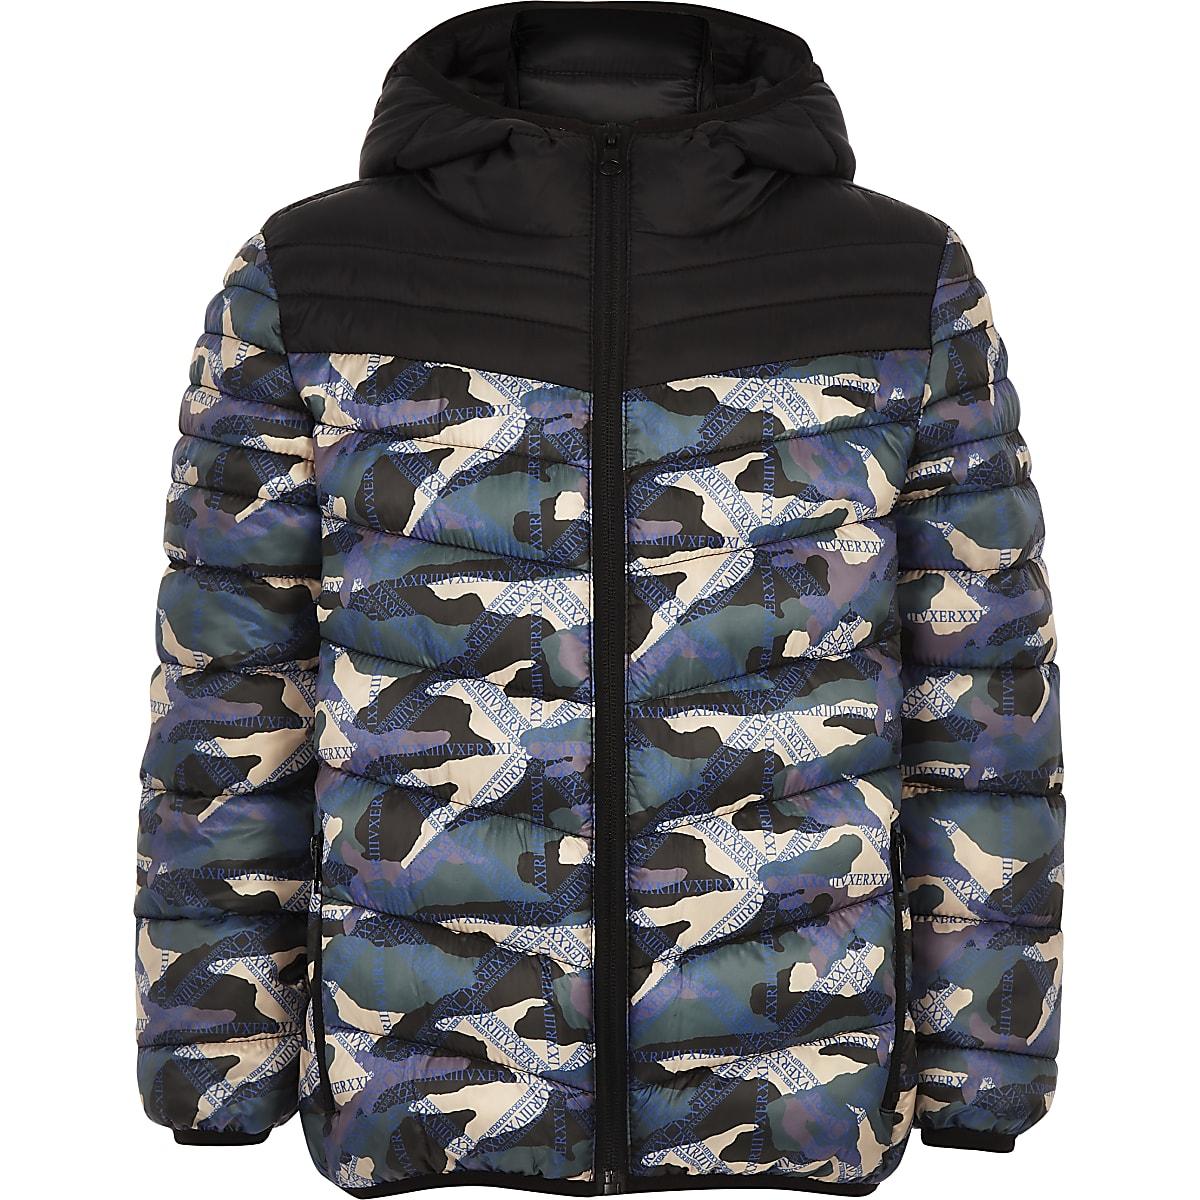 Boys RI Active black camo puffer jacket